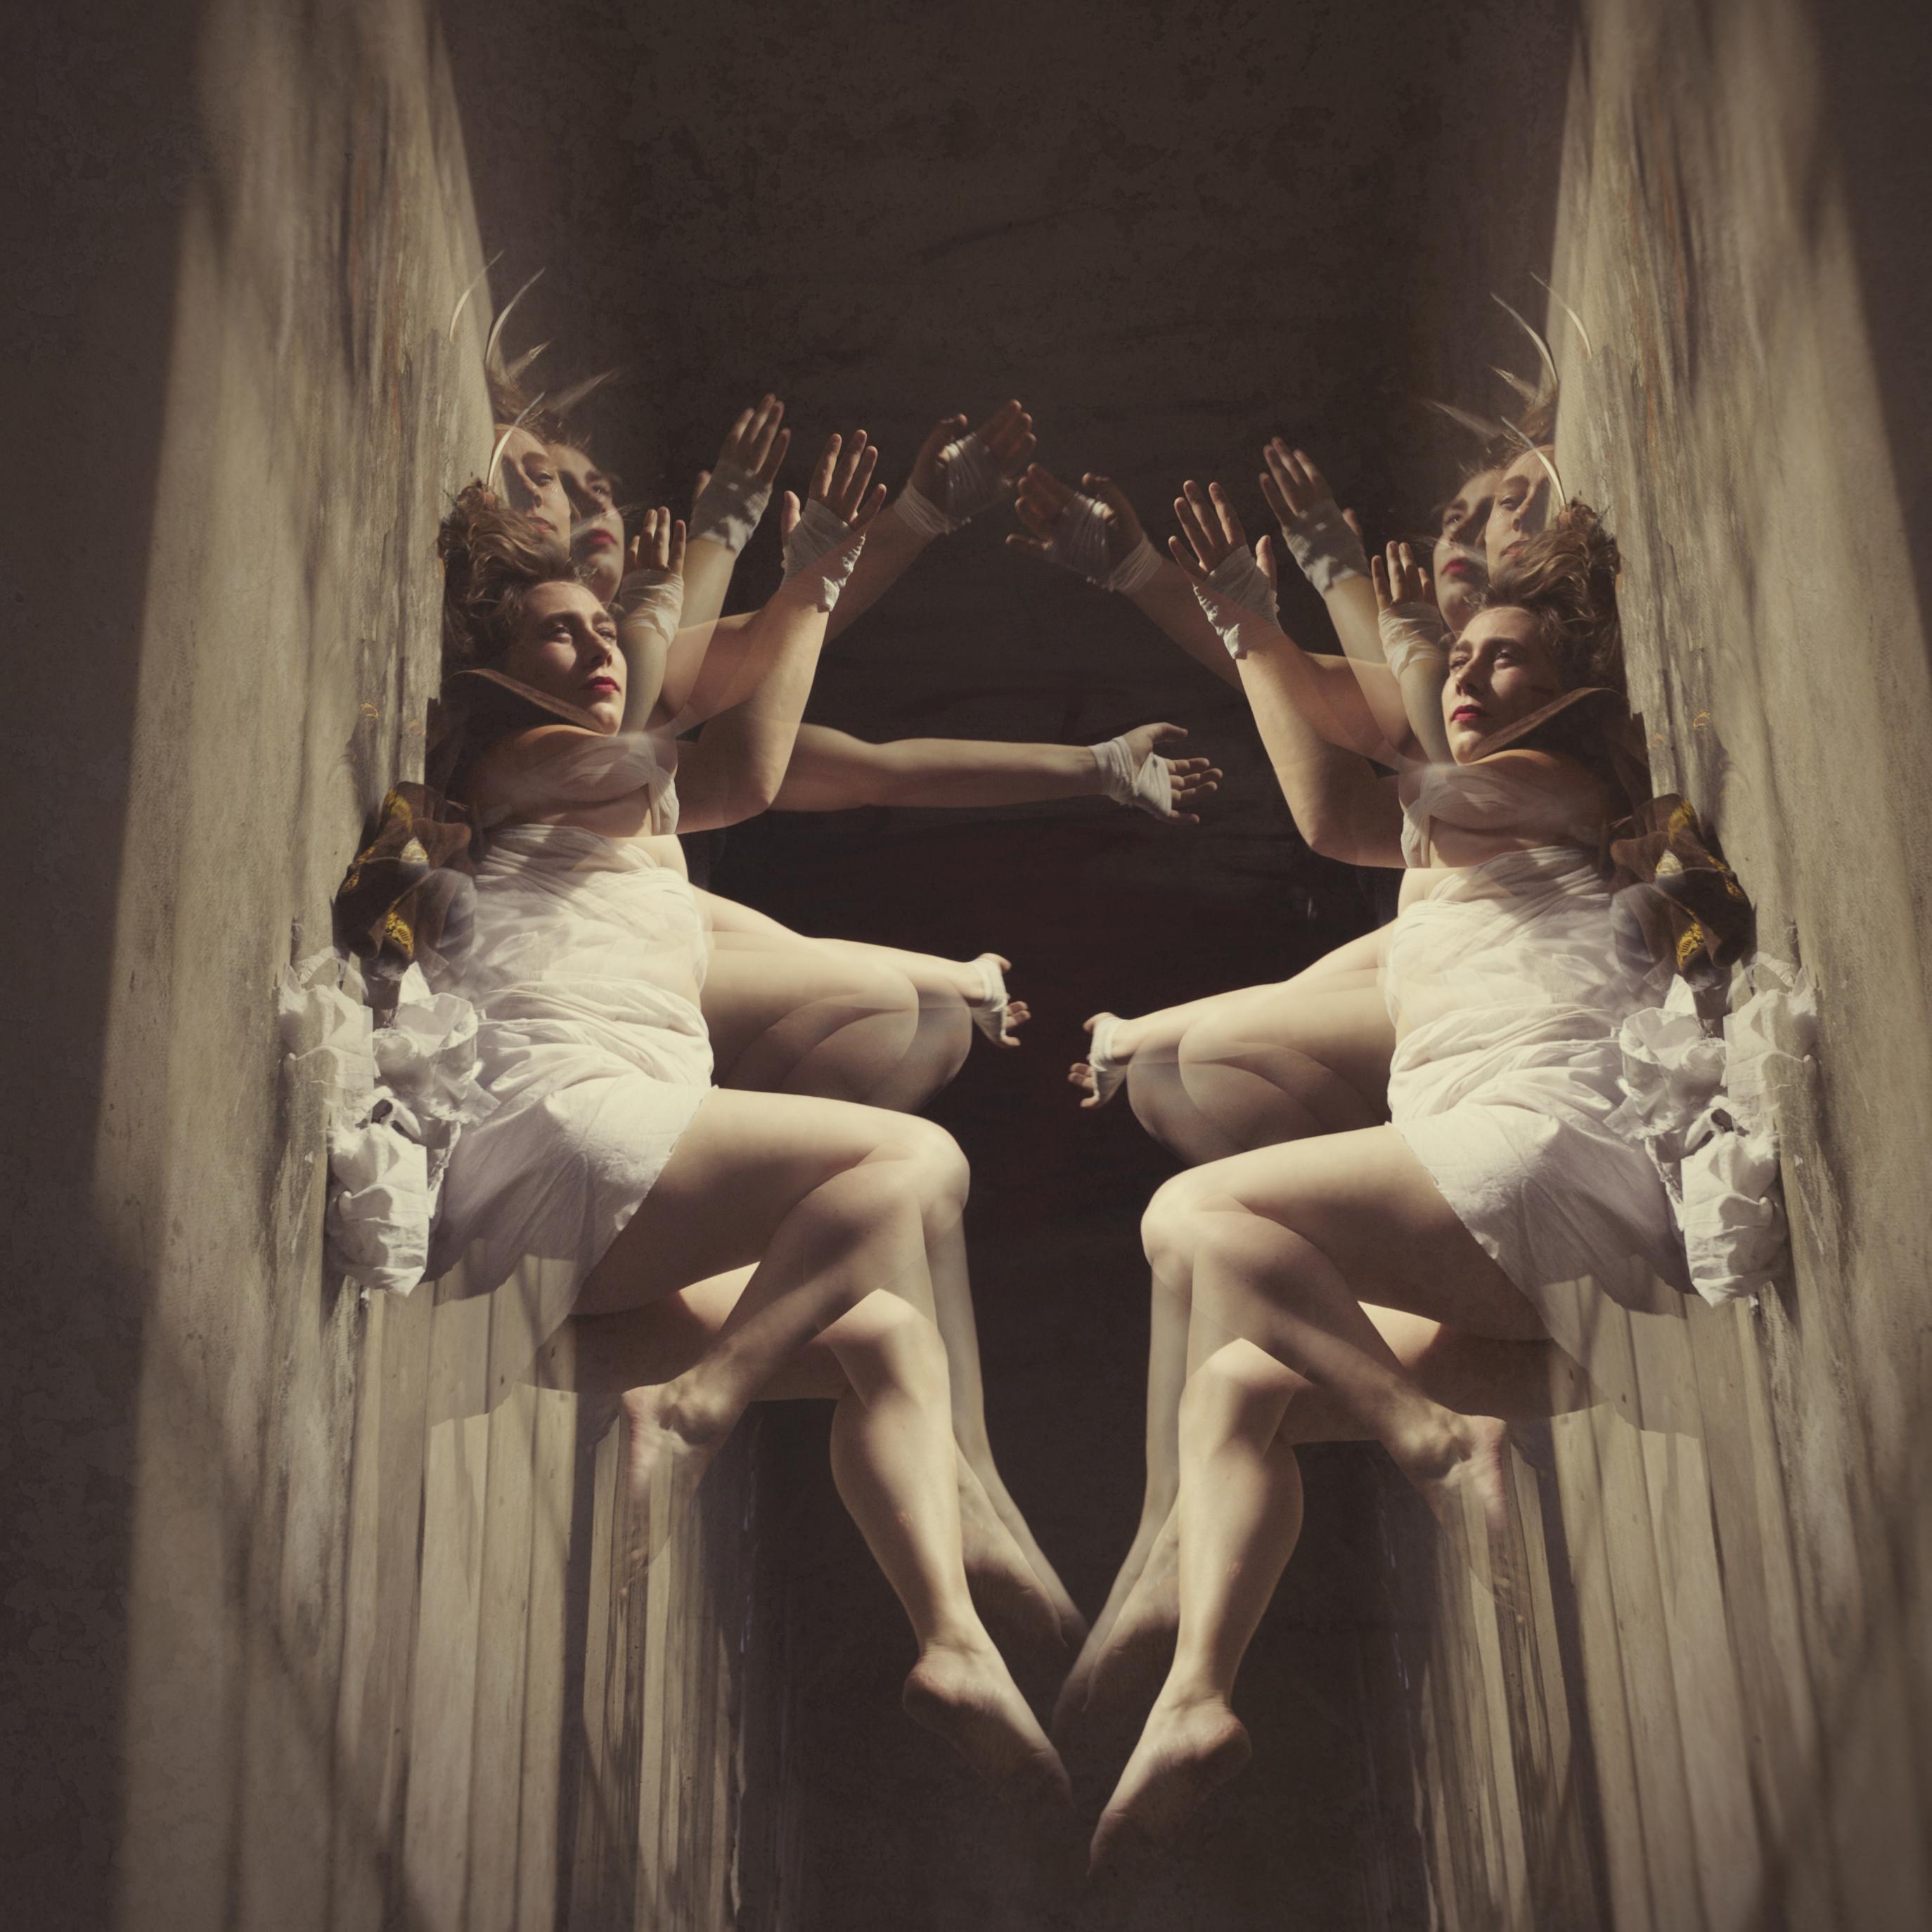 Isol buffy photographe artiste visuel musique